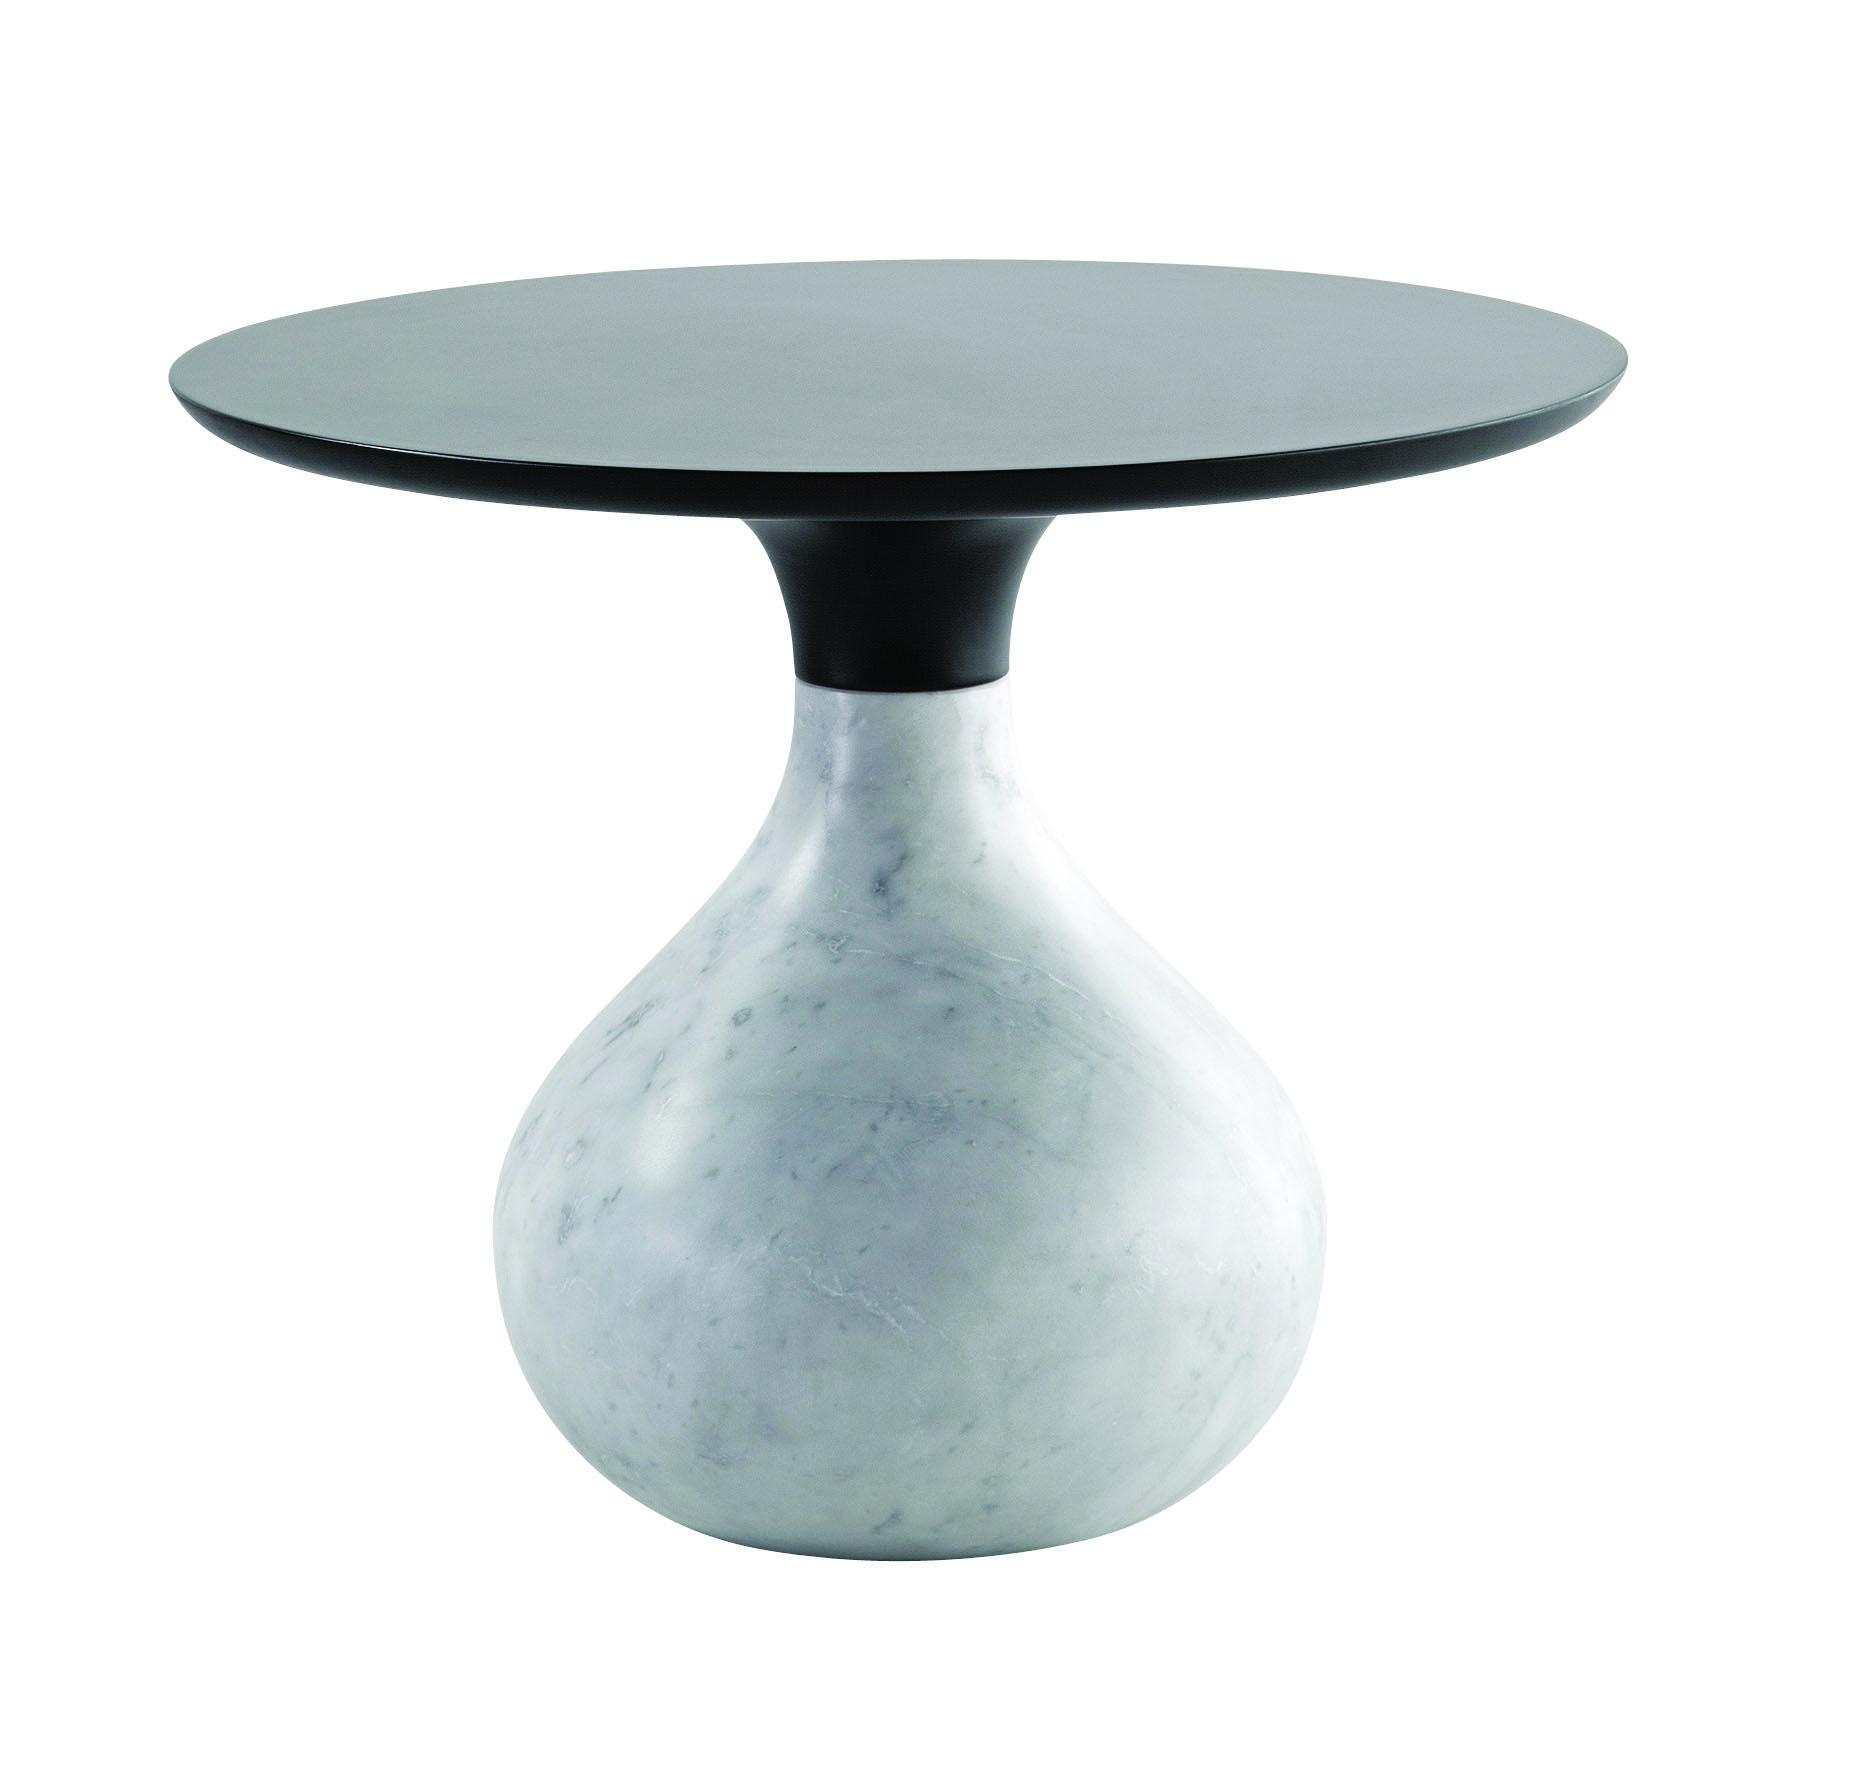 Roche Bobois AQUA dining table